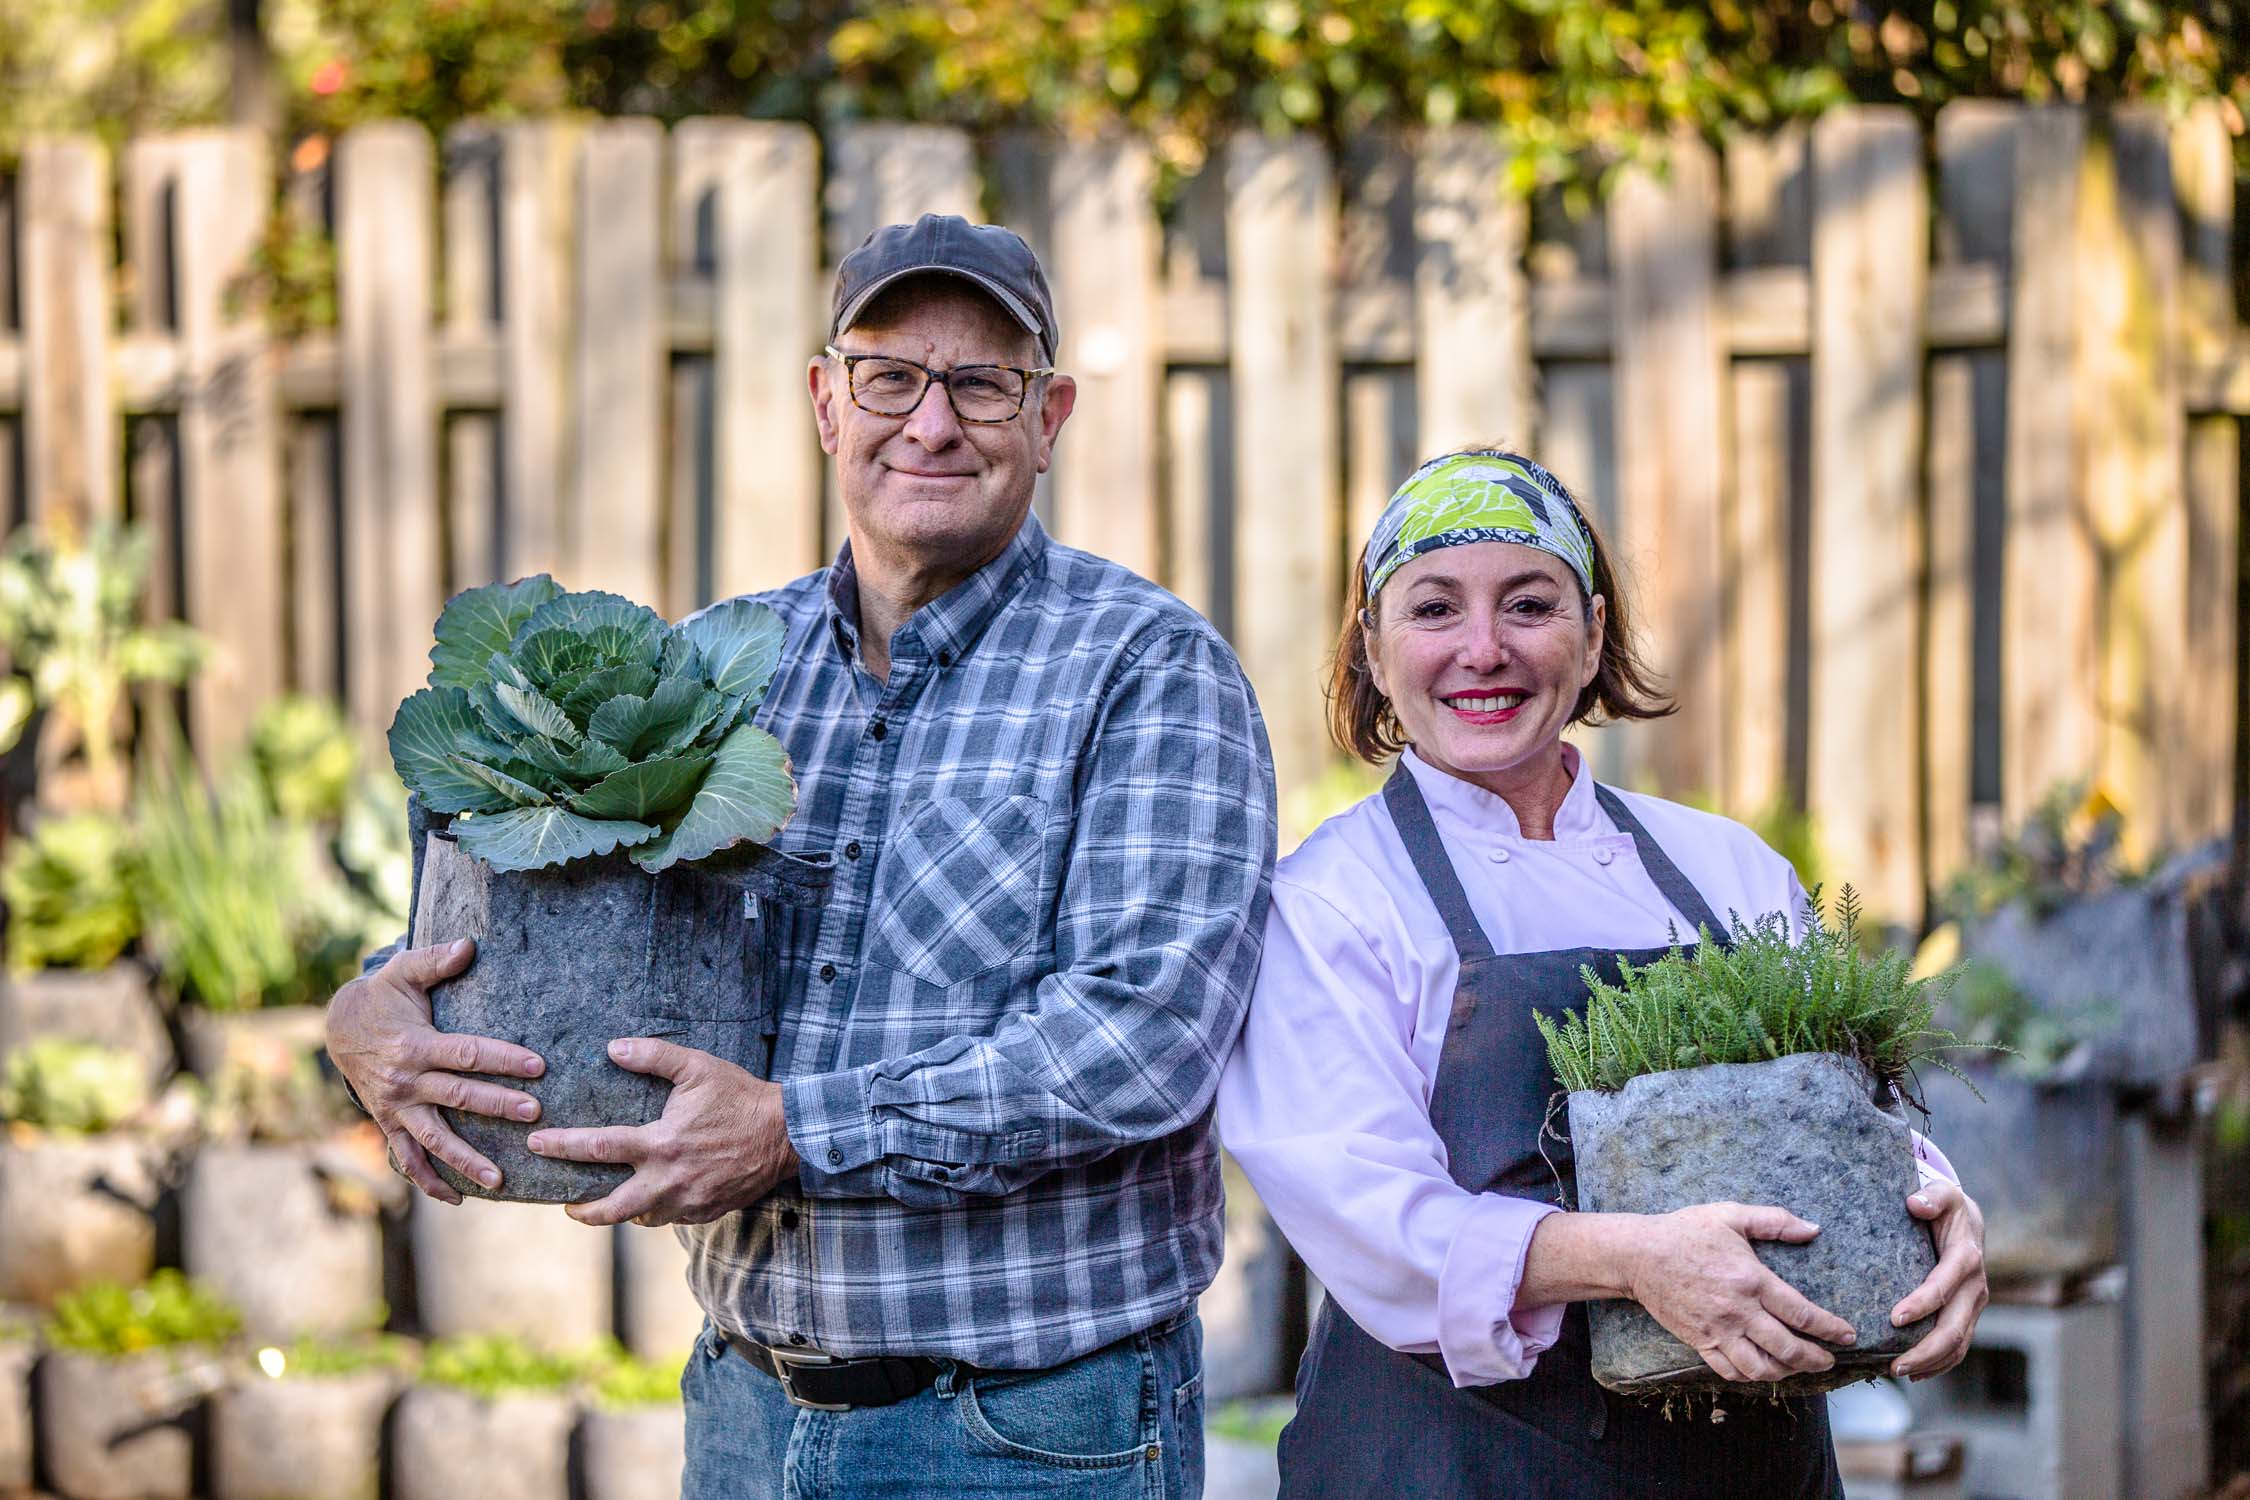 Souper-Jenny-Levison-in-her-gardens-Erik-Meadows